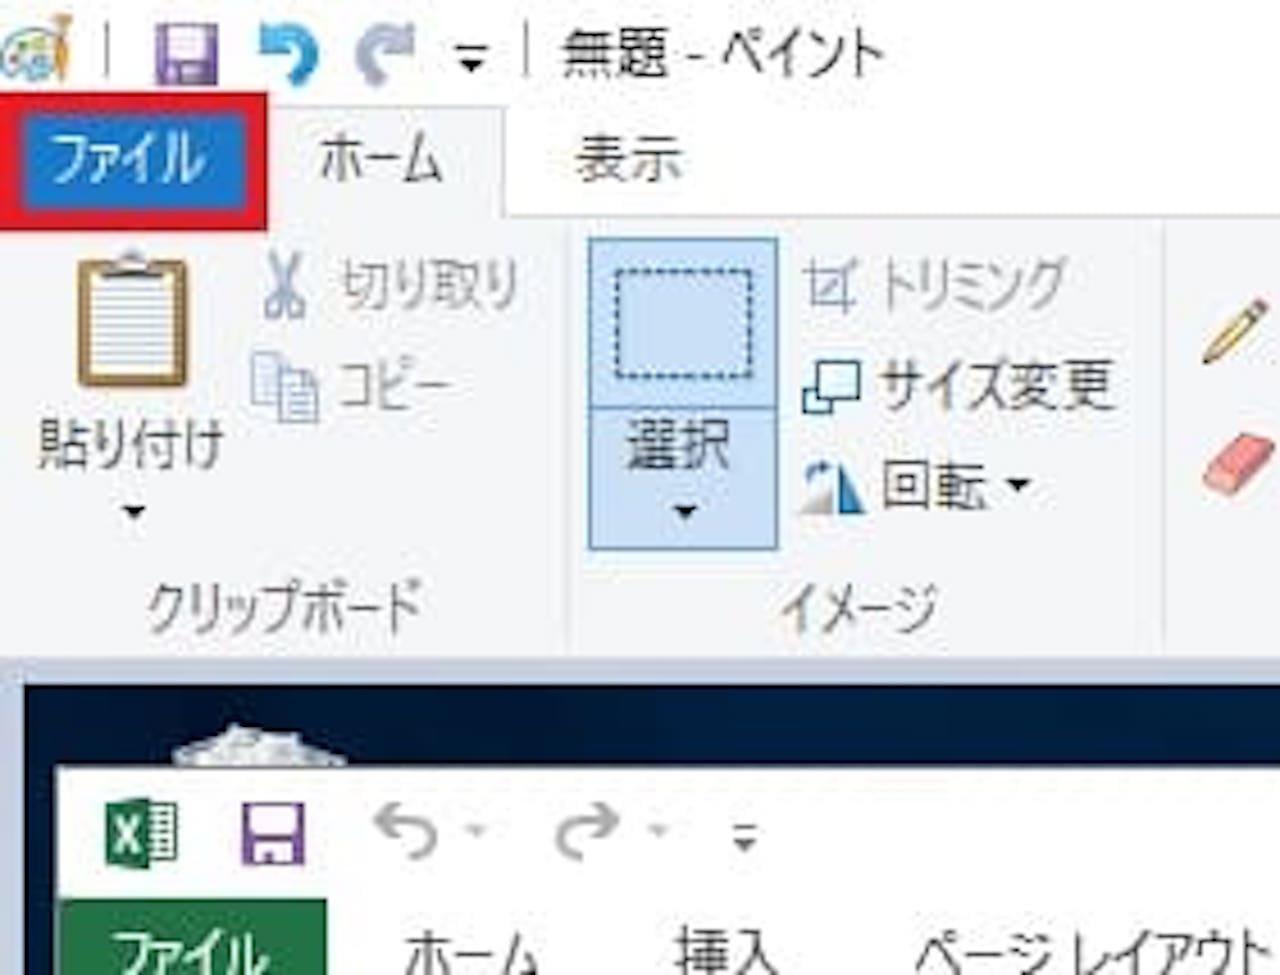 Windows10で撮ったスクリーンショットを画像として保存する方法⑥